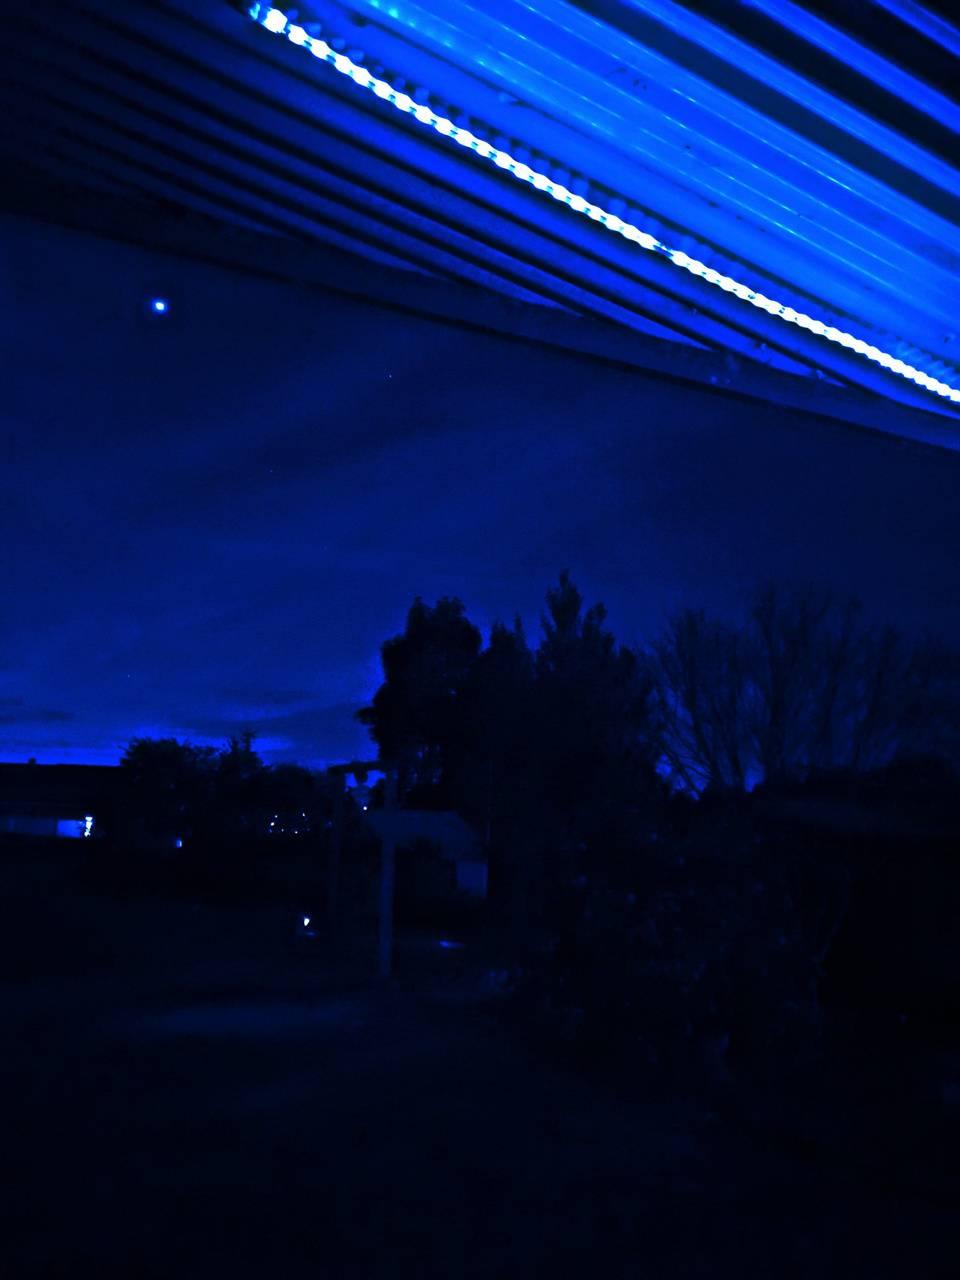 Neon blue night